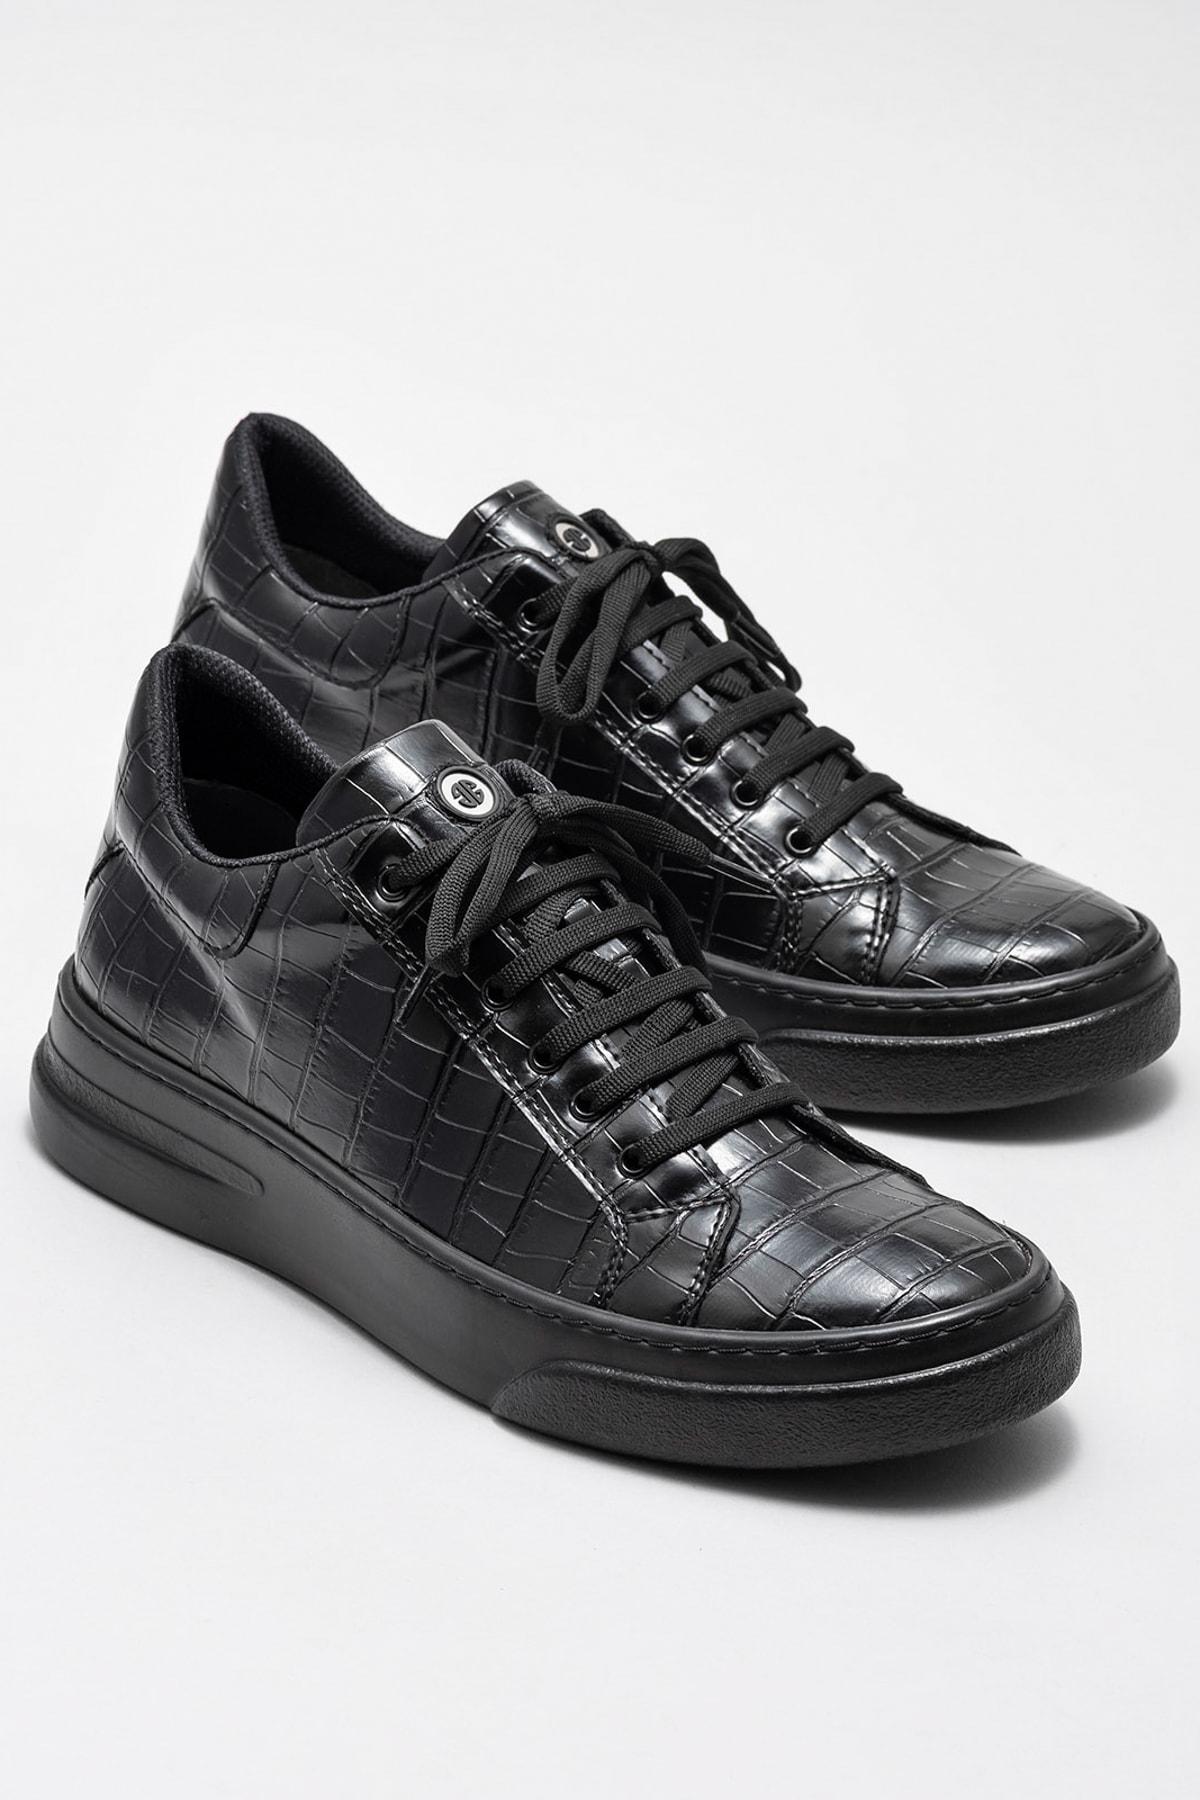 Elle Shoes Erkek Casual Ayakkabı Storm-1 20KTA828-2 2